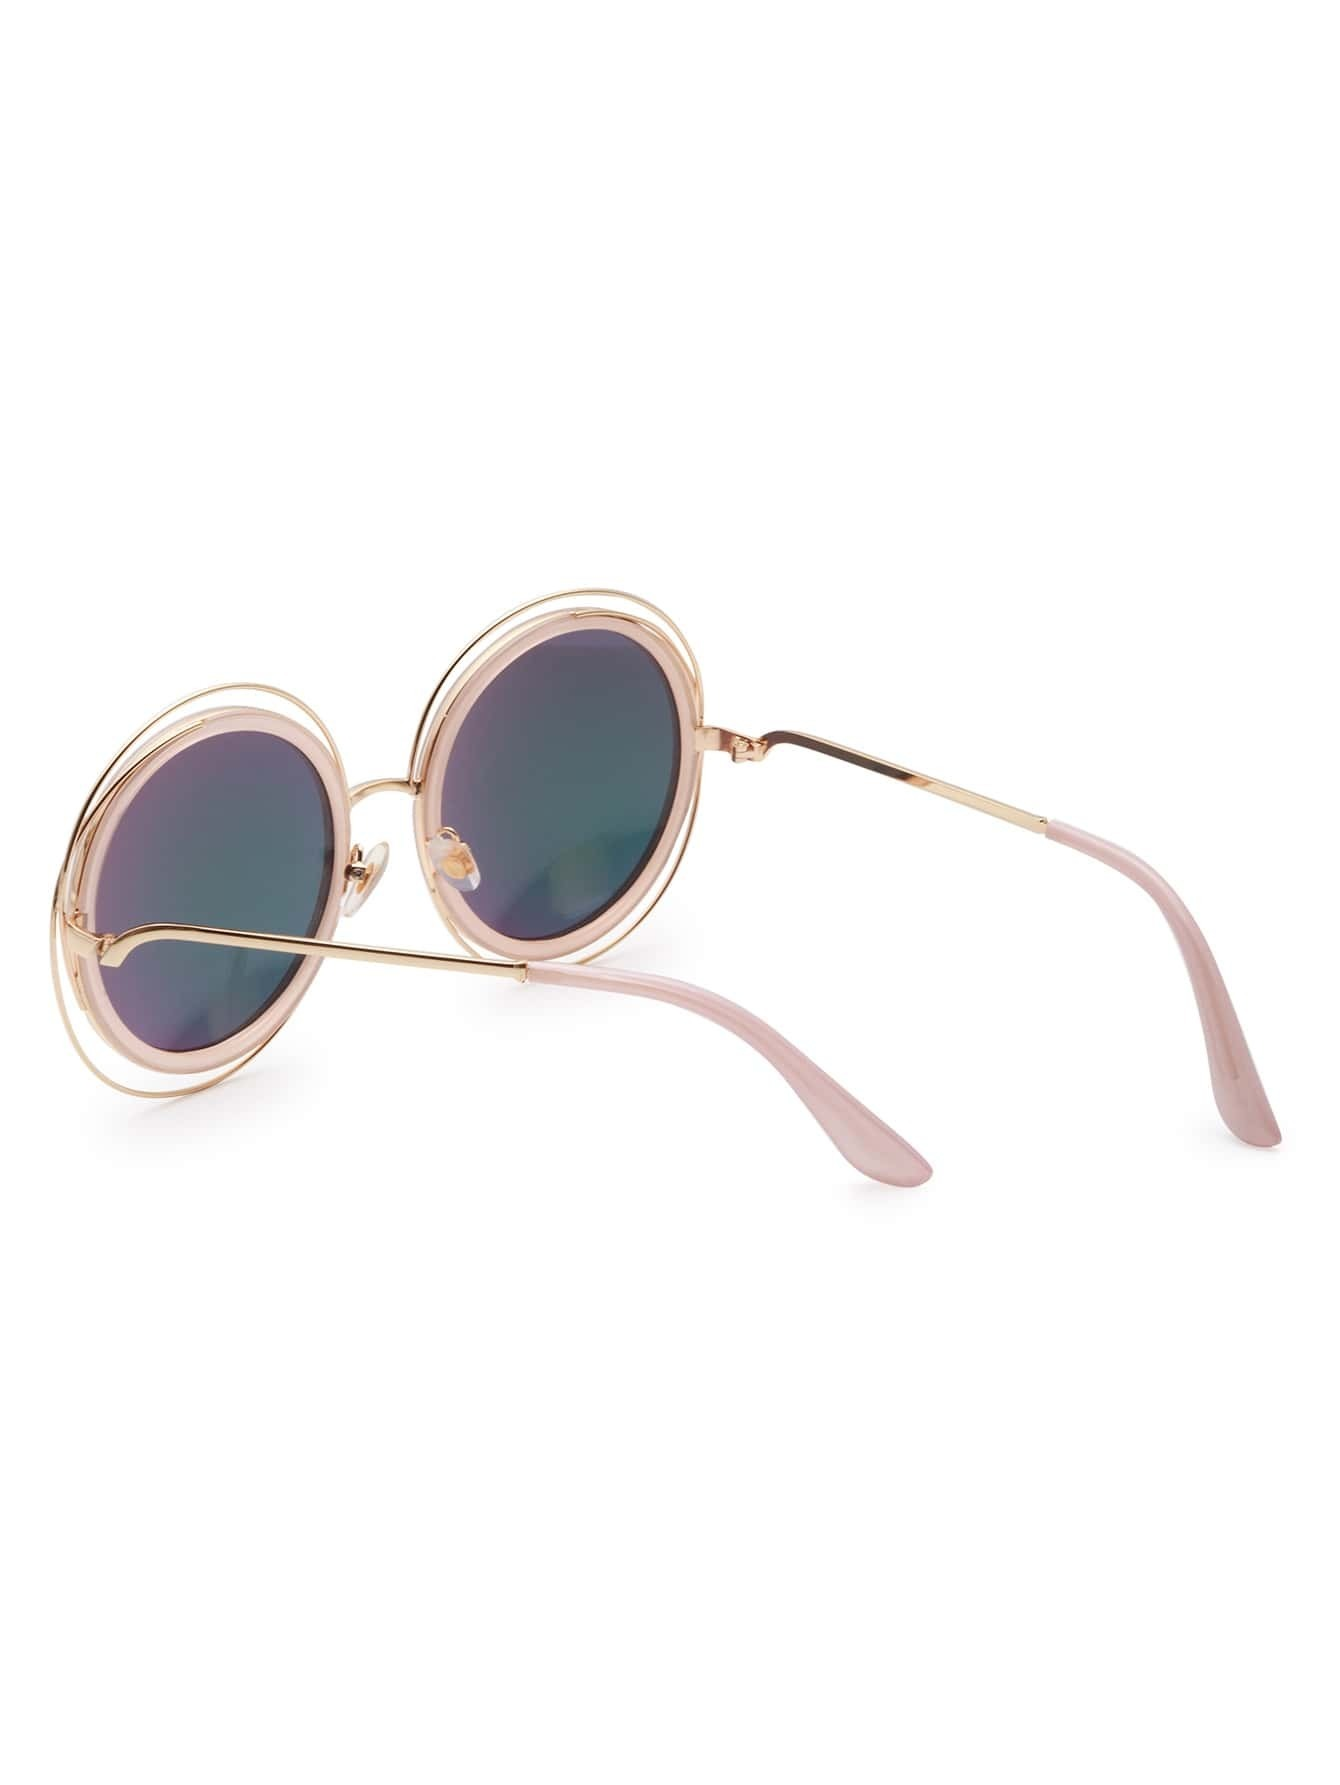 Gold Frame Pink Lens Sunglasses -SheIn(Sheinside)